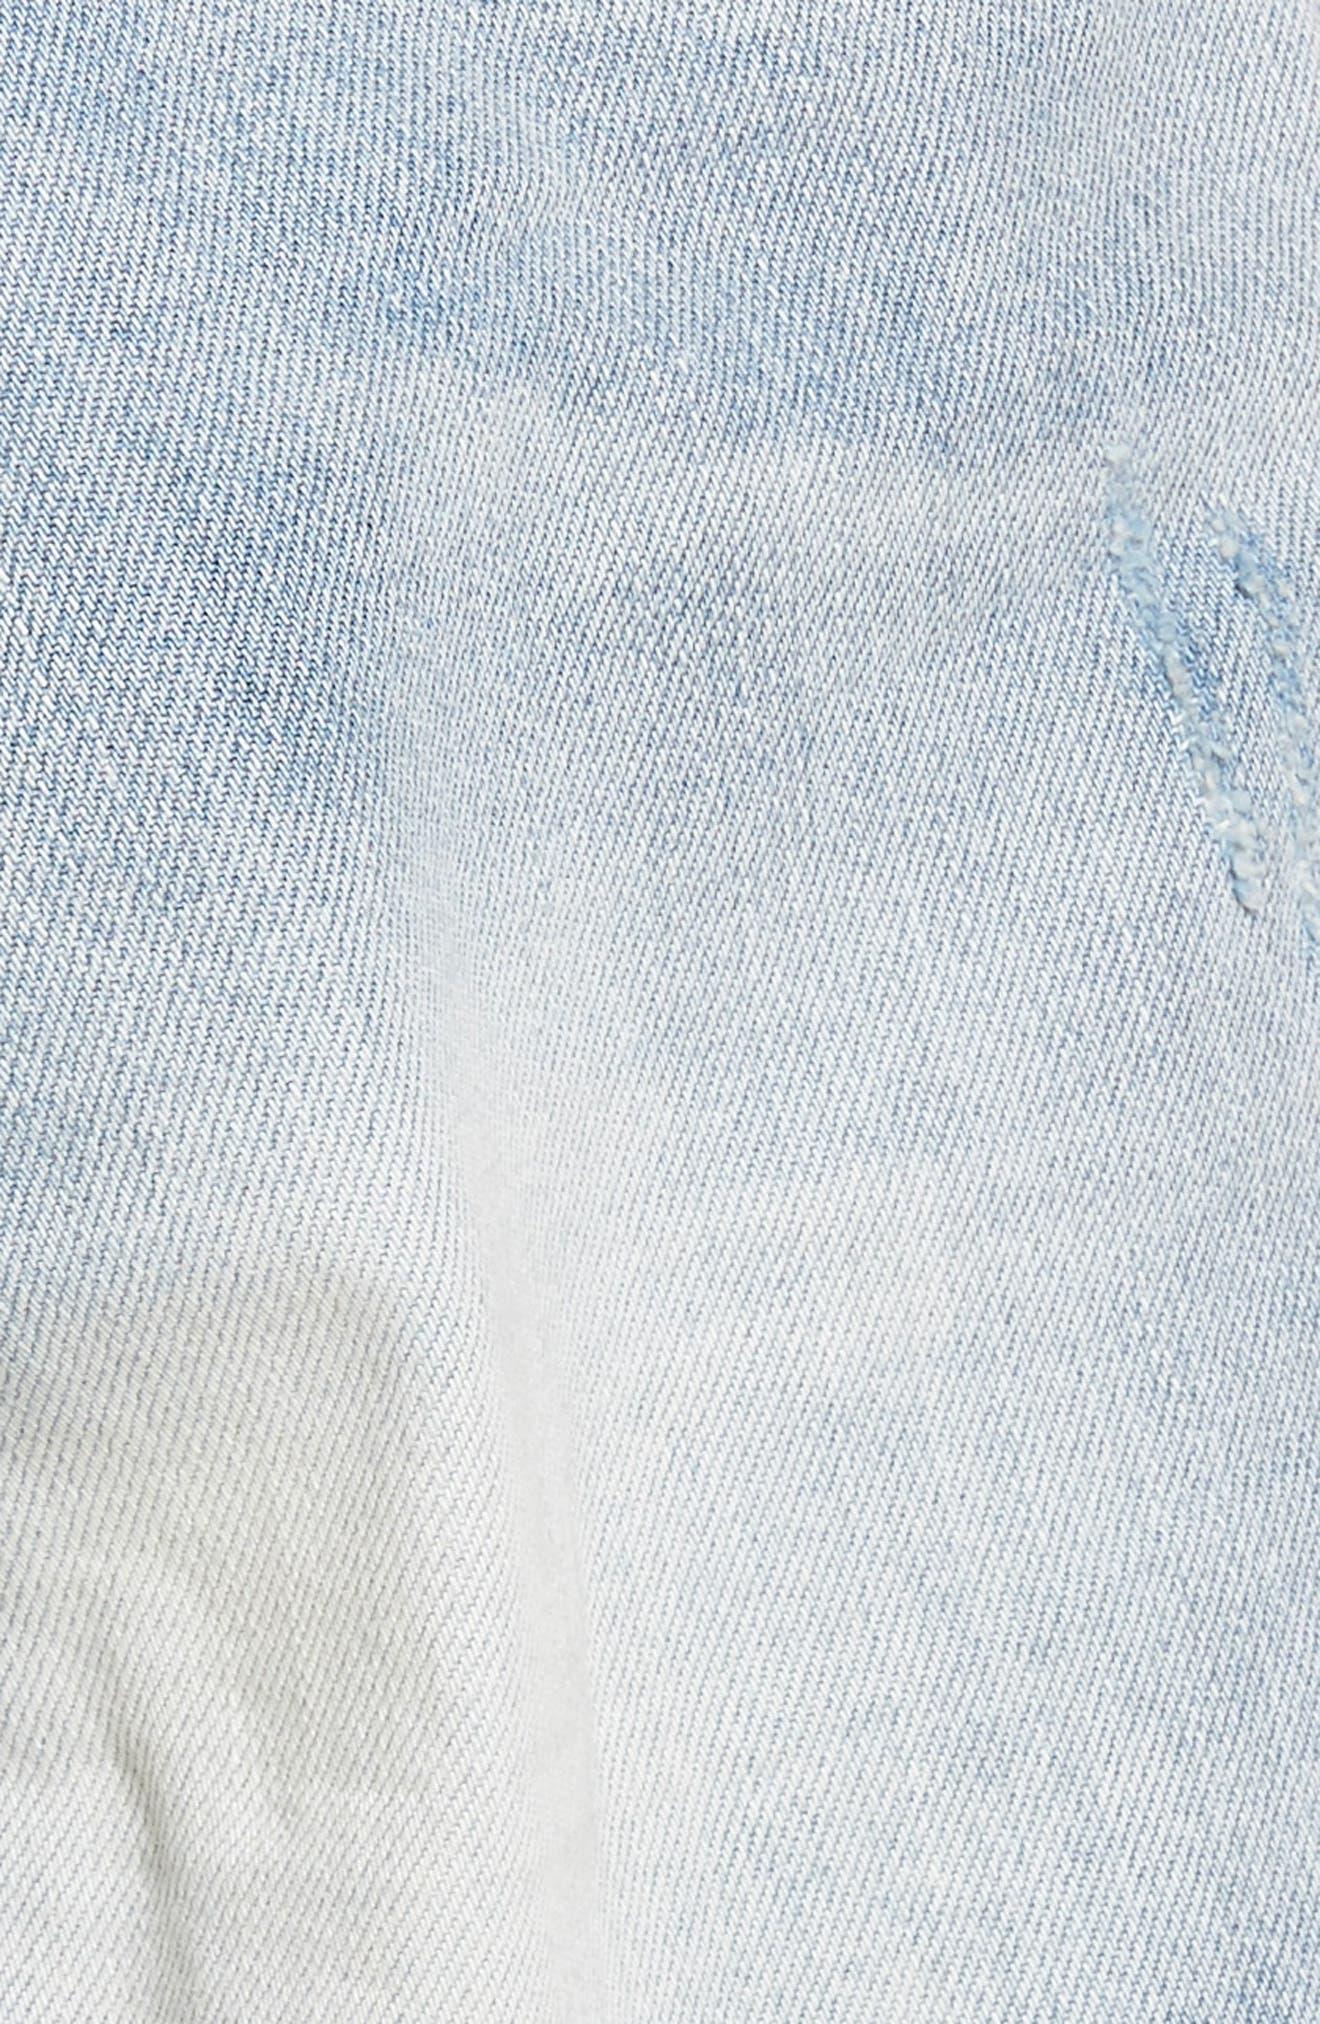 Arien High Waist Cutoff Denim Shorts,                             Alternate thumbnail 5, color,                             Washed Blue